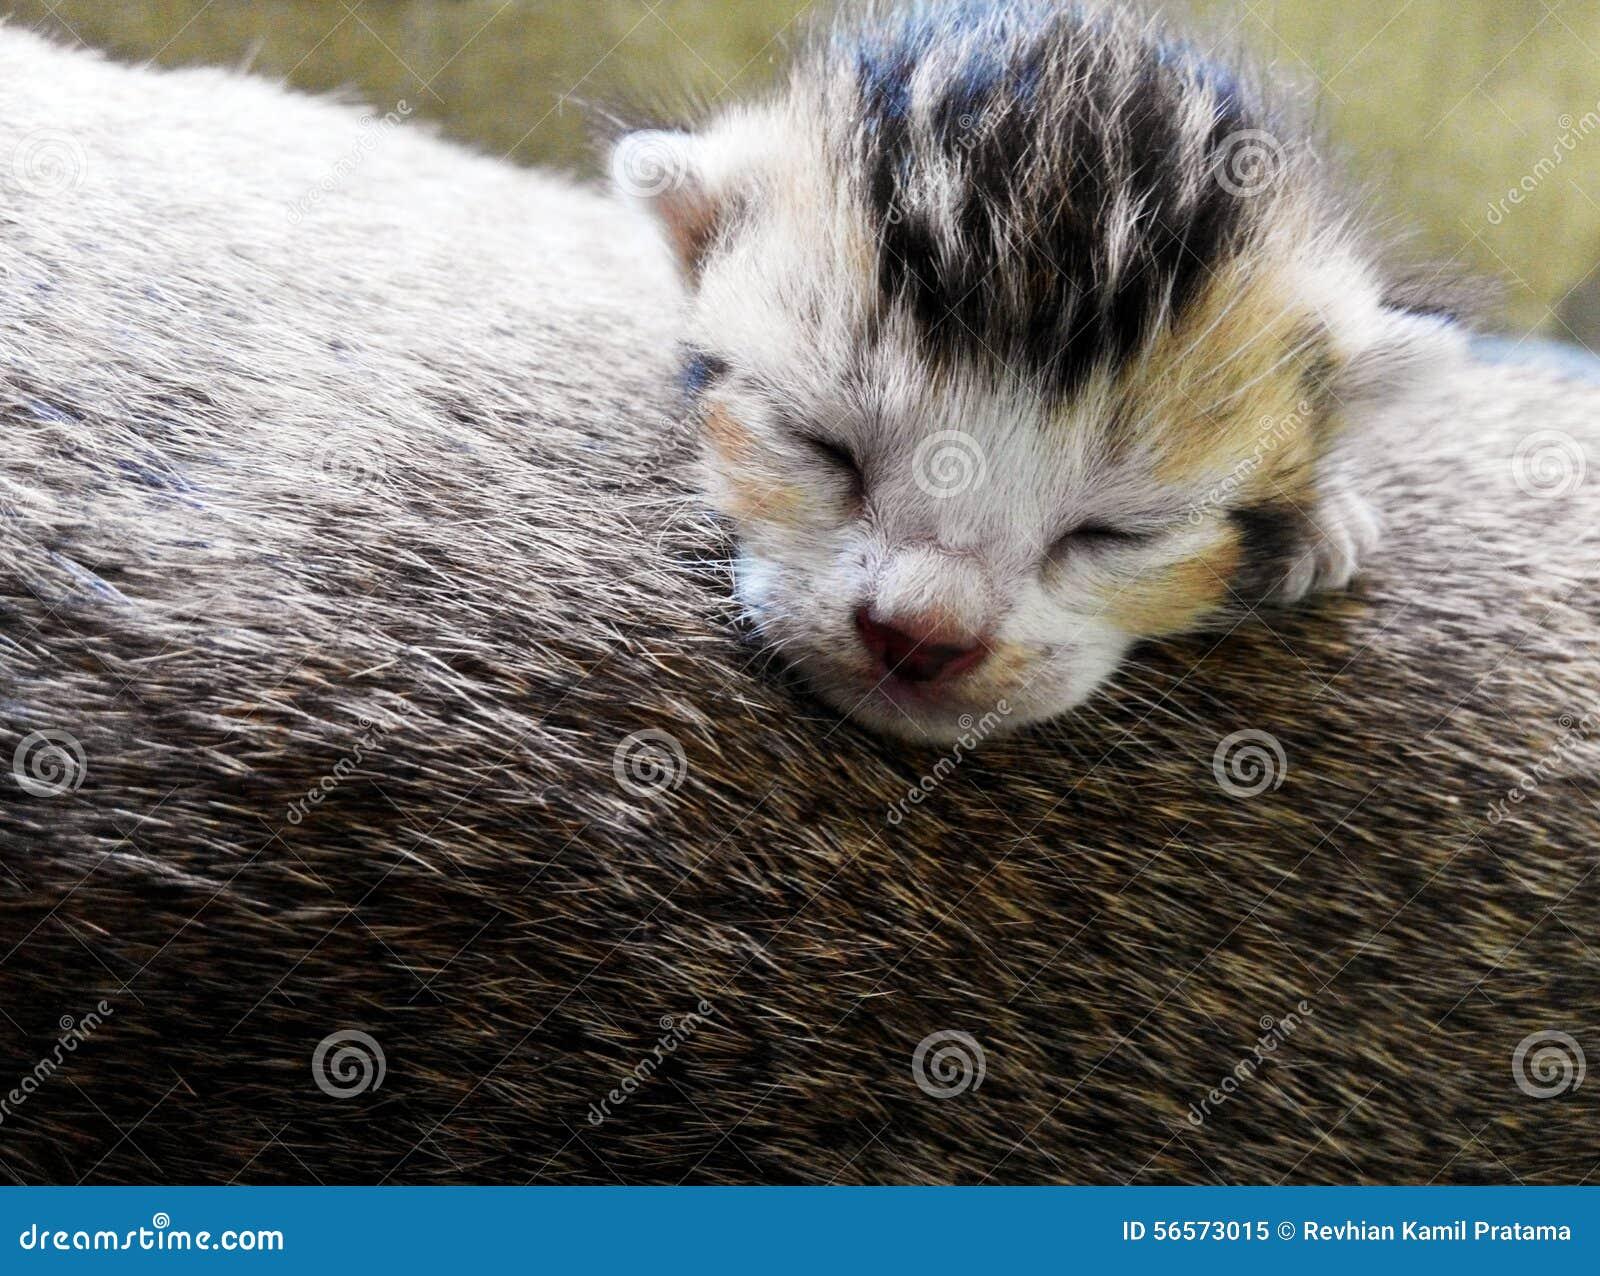 Download γατάκι νυσταλέο στοκ εικόνα. εικόνα από κατόπιν, παιγμένος - 56573015